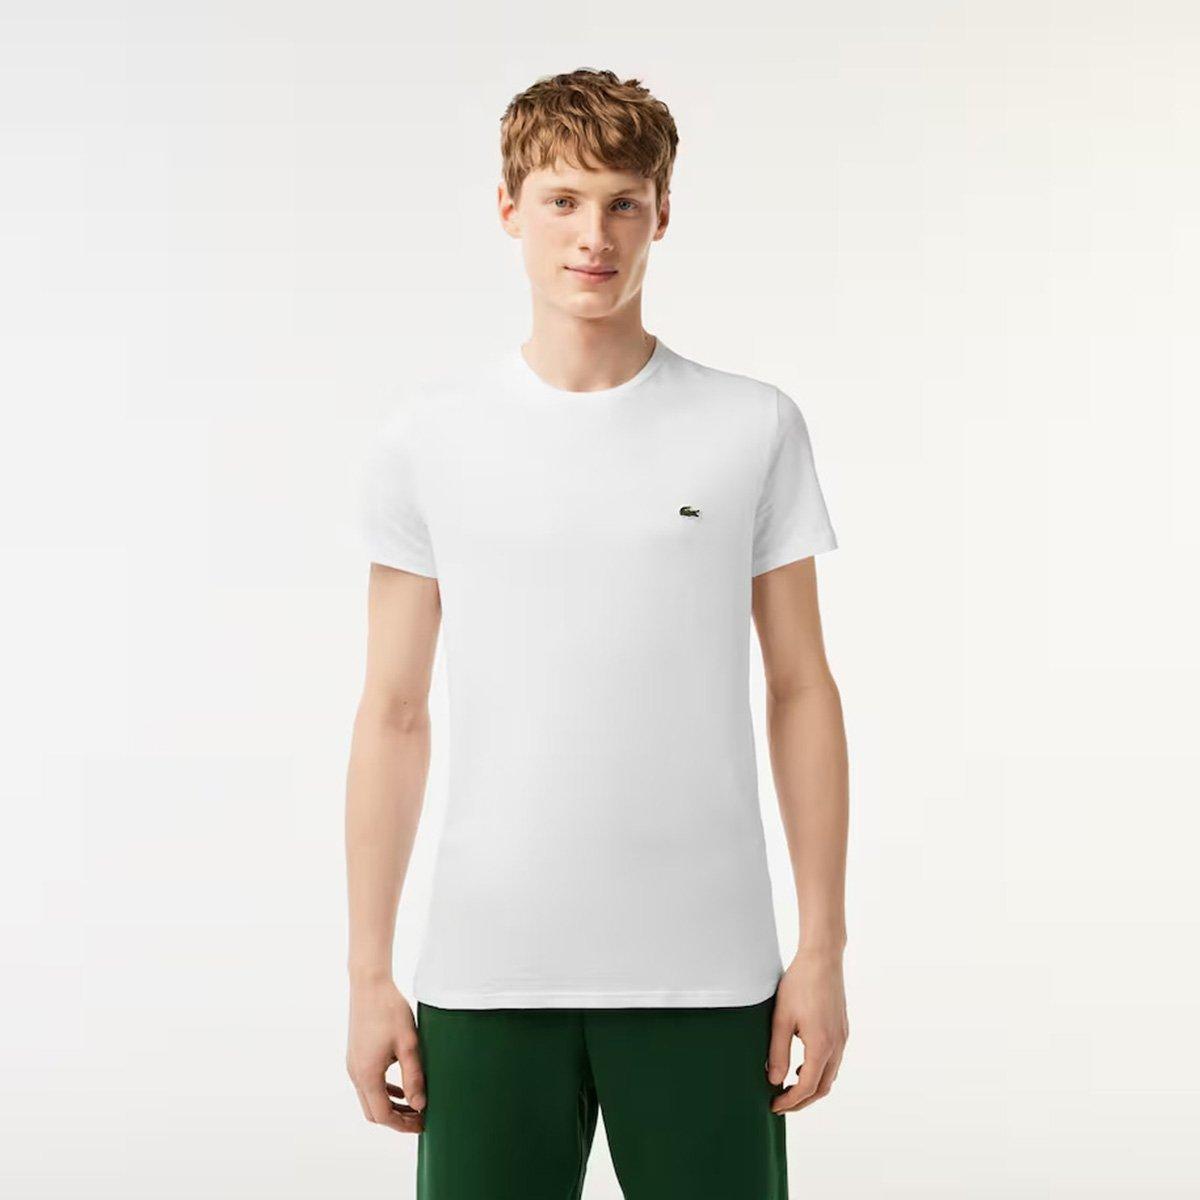 Camiseta Lacoste Básica Jersey Masculina - Branco - Compre Agora ... b76afbe501